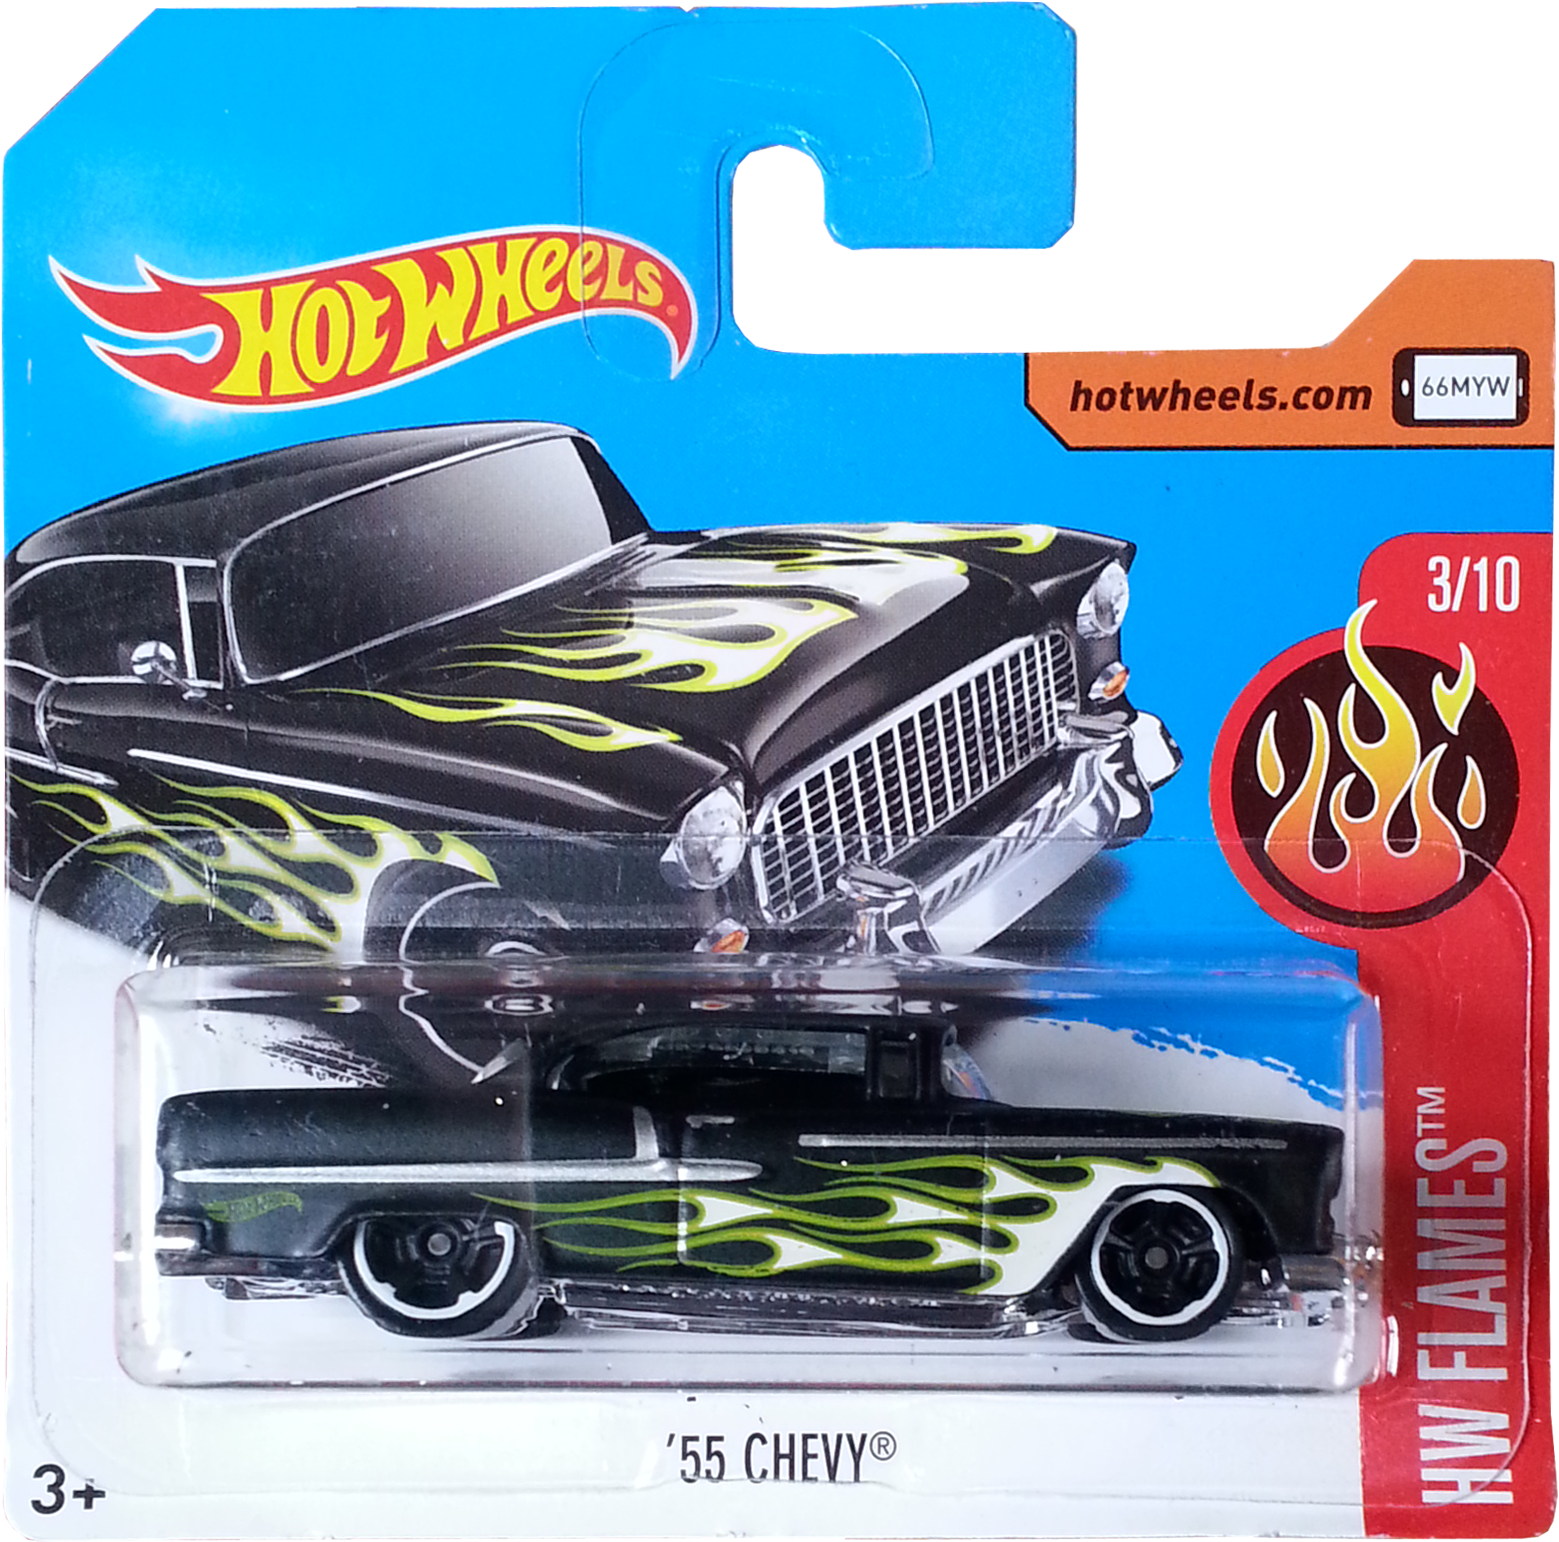 39 55 Chevy Model Cars Hobbydb Hot Wheel Gifts Chevy Models